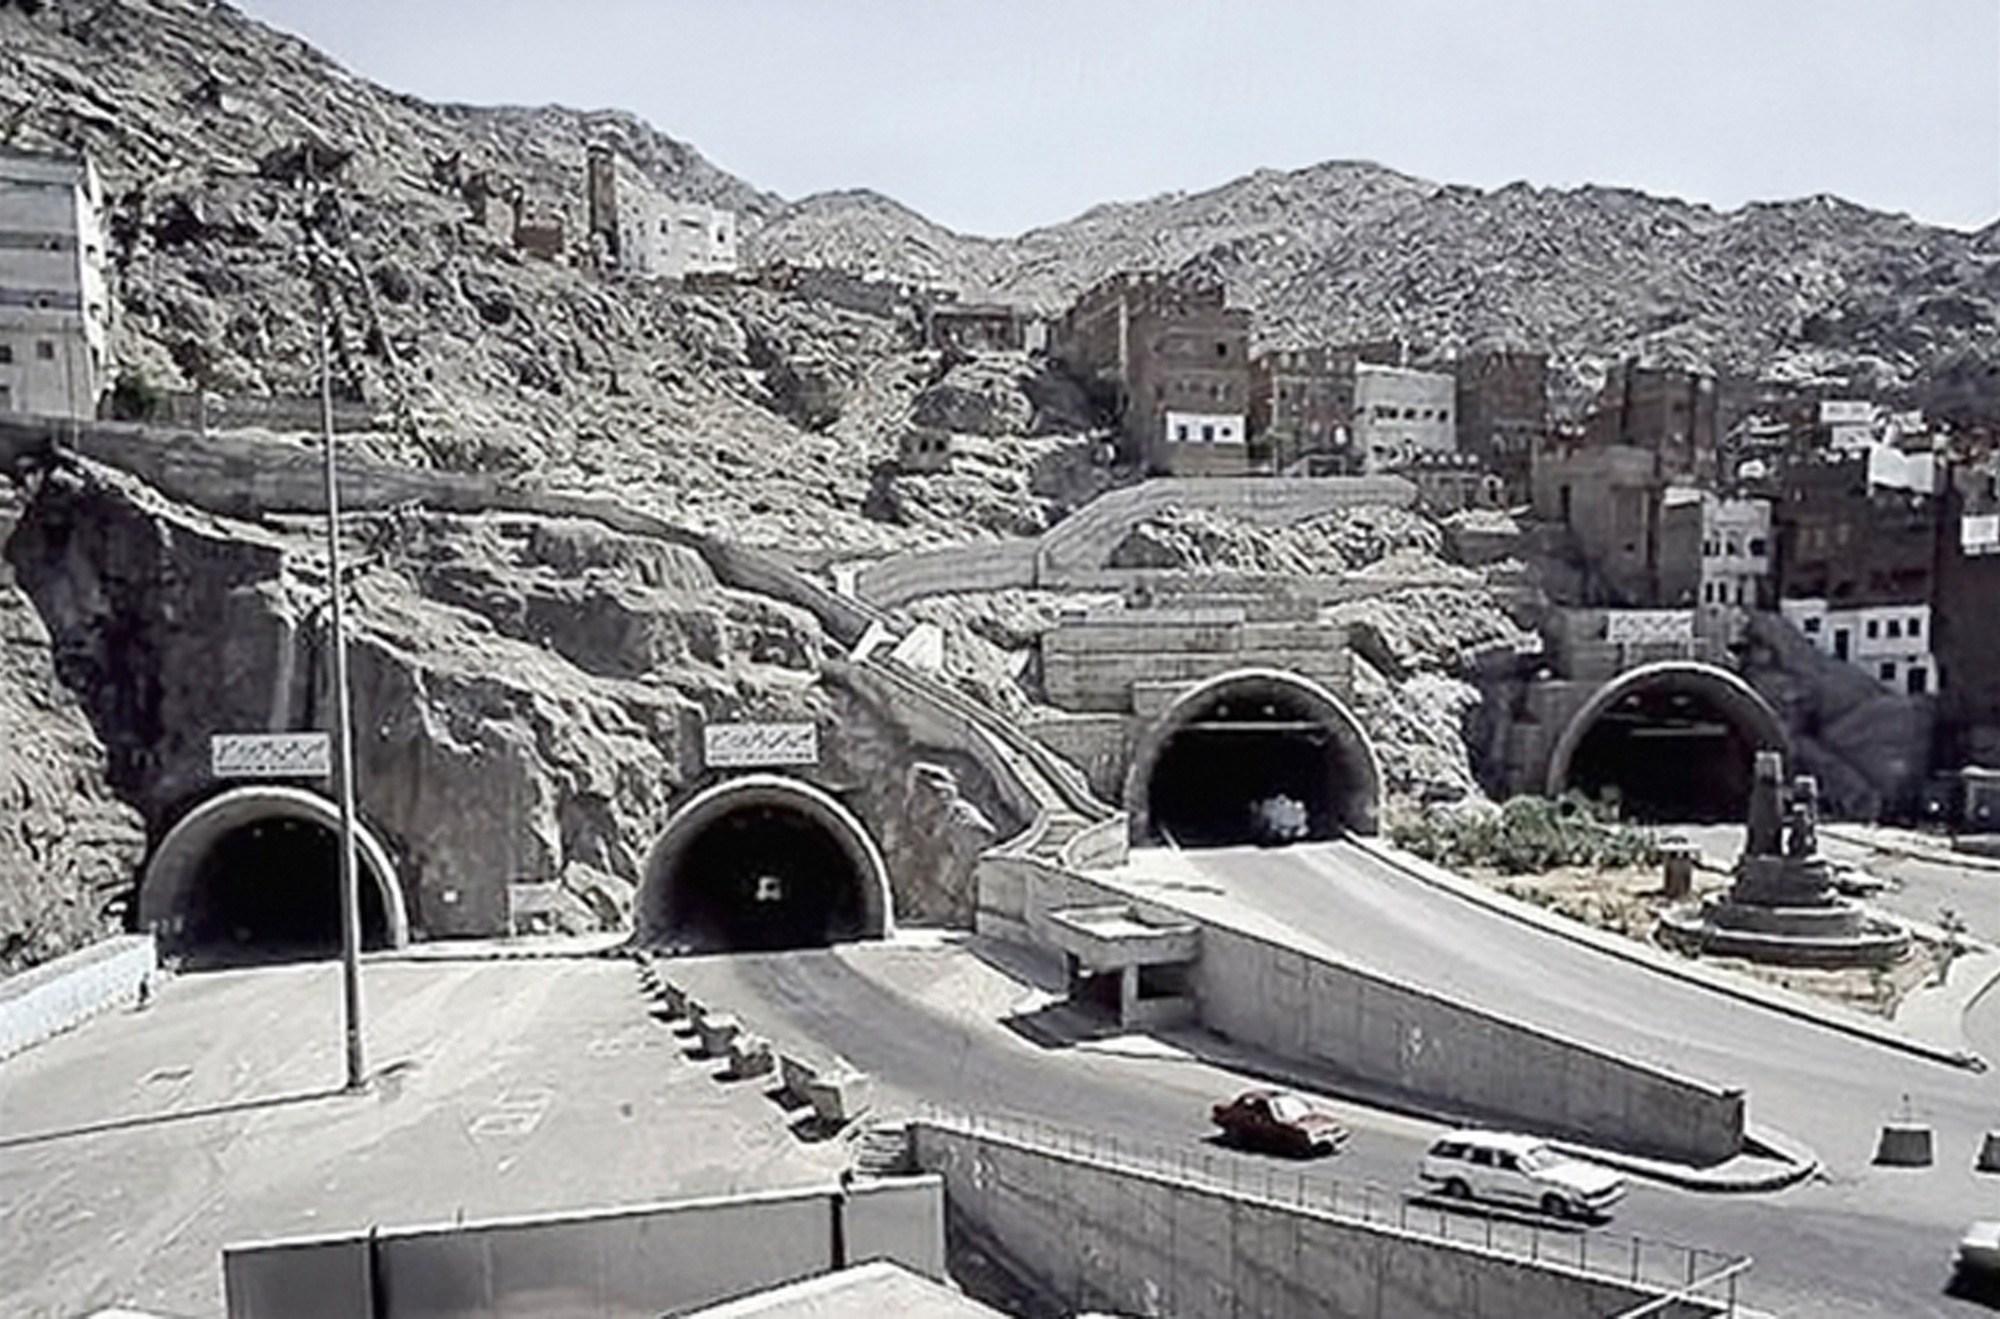 Tunnels in Mecca